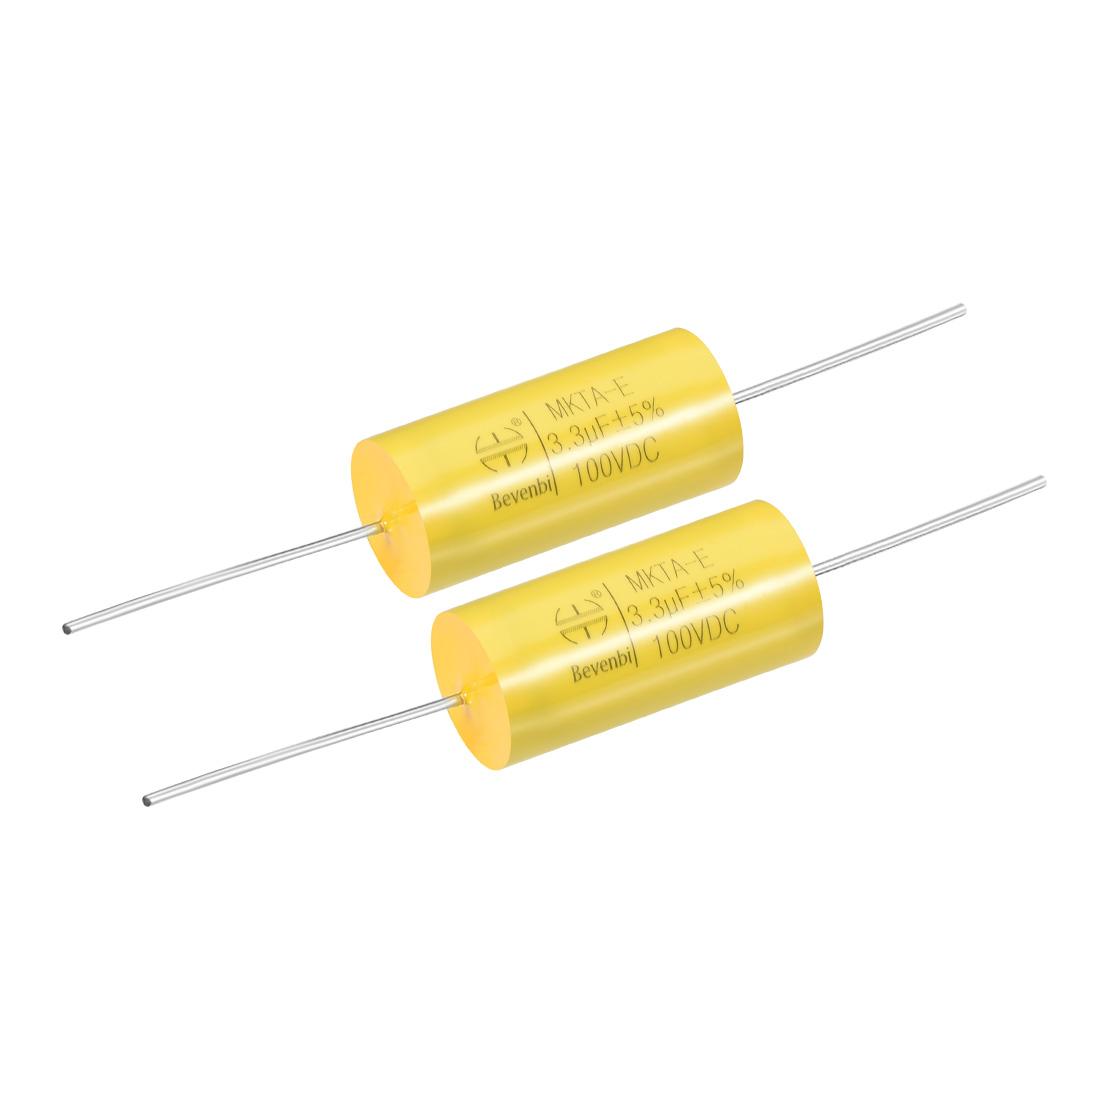 Film Capacitor 100V DC 3.3uF MKTA-E Round Polypropylene Capacitors Yellow 2pcs